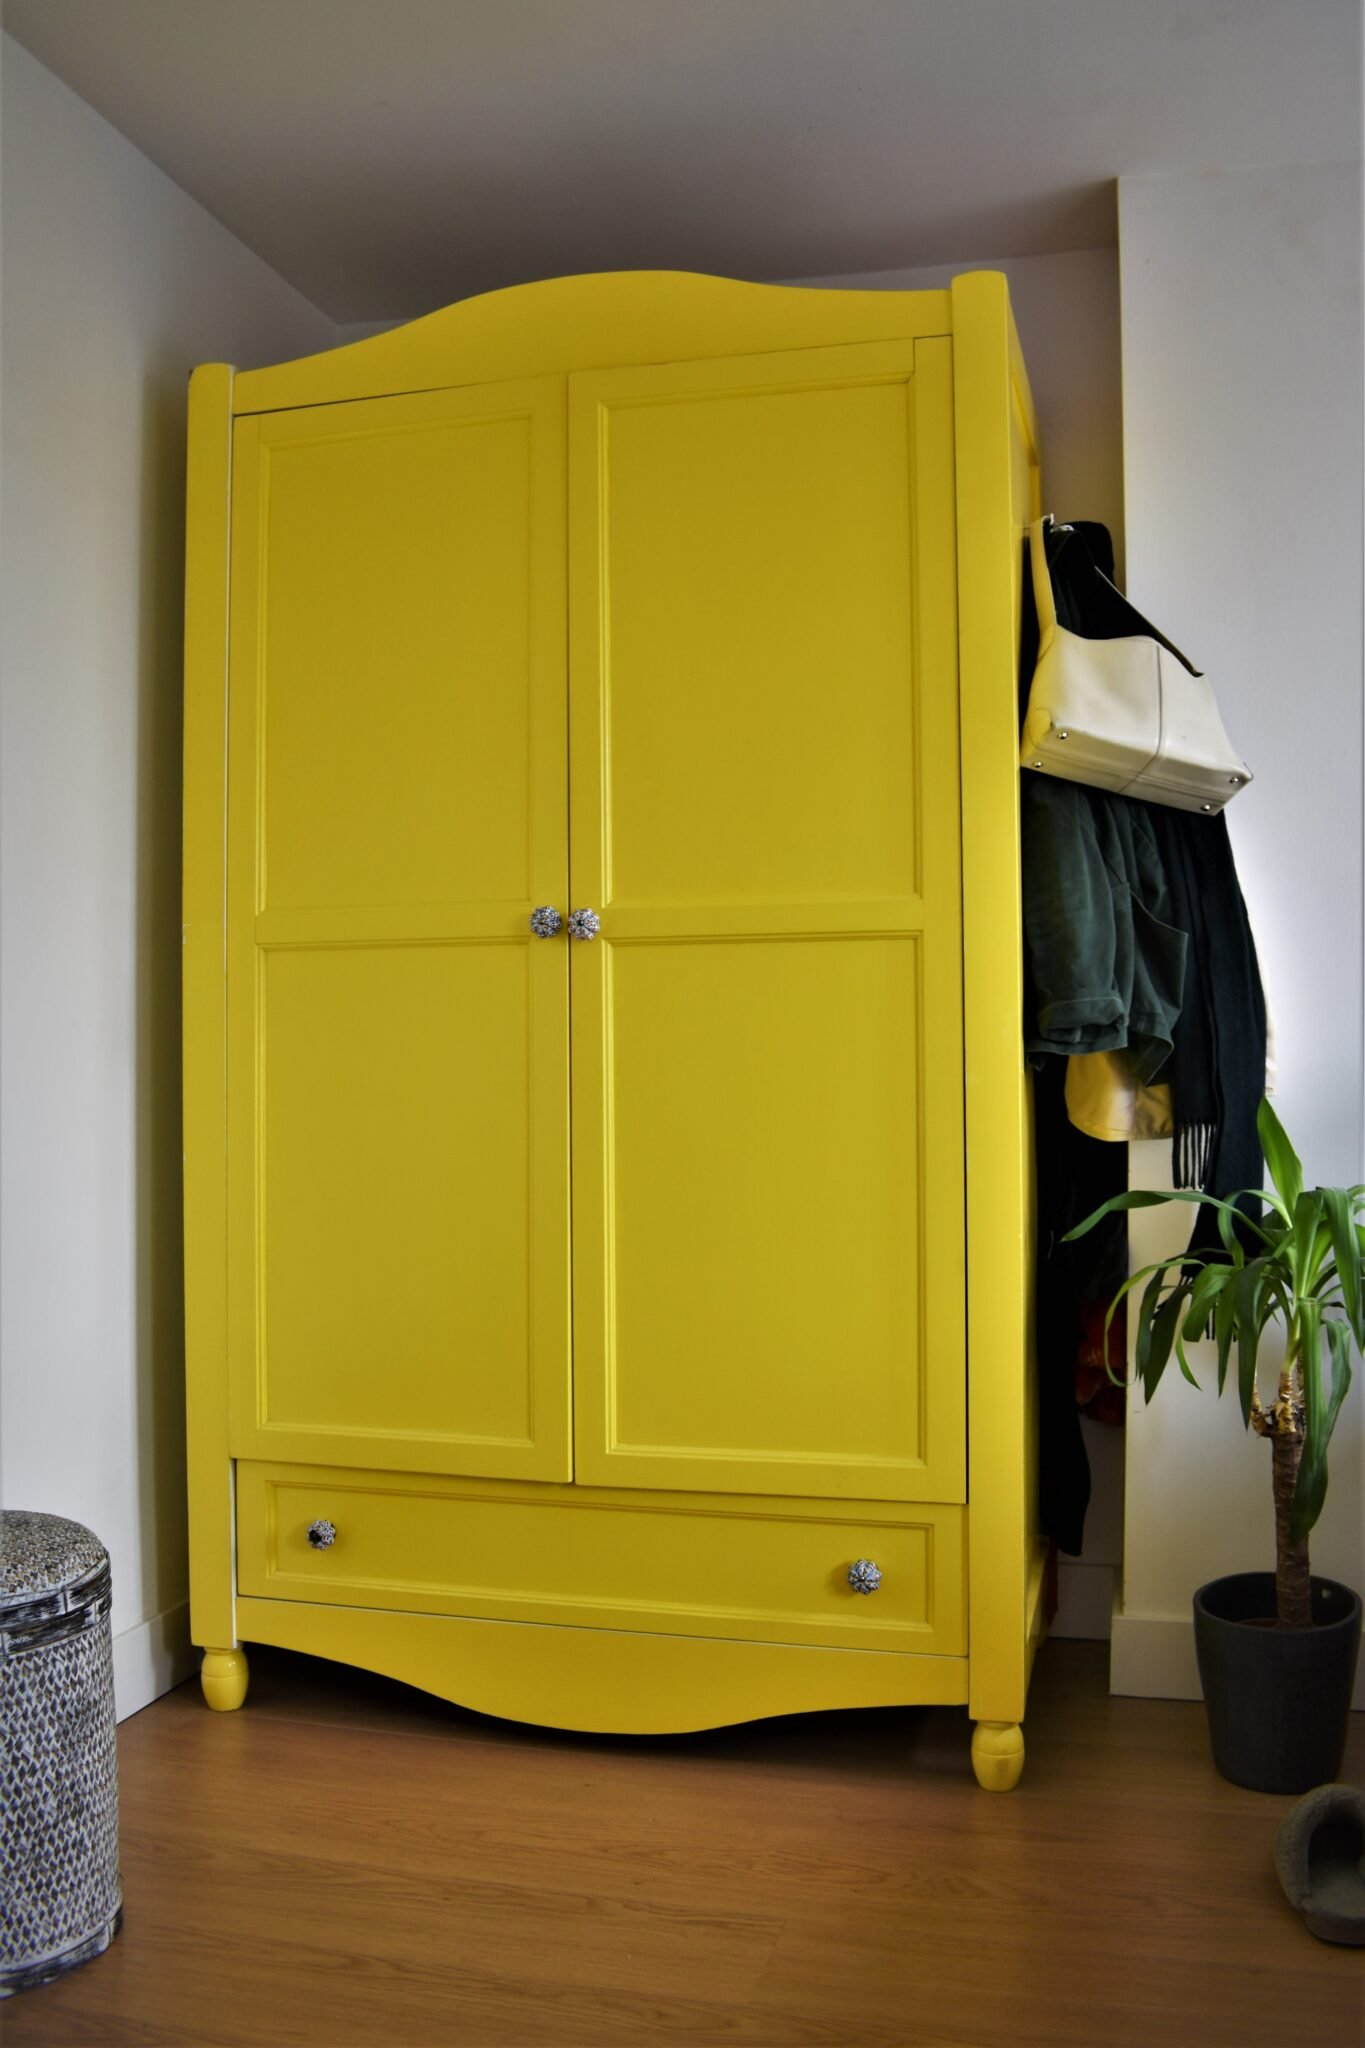 binnenkijken bij annabel en alex gele kledingkast